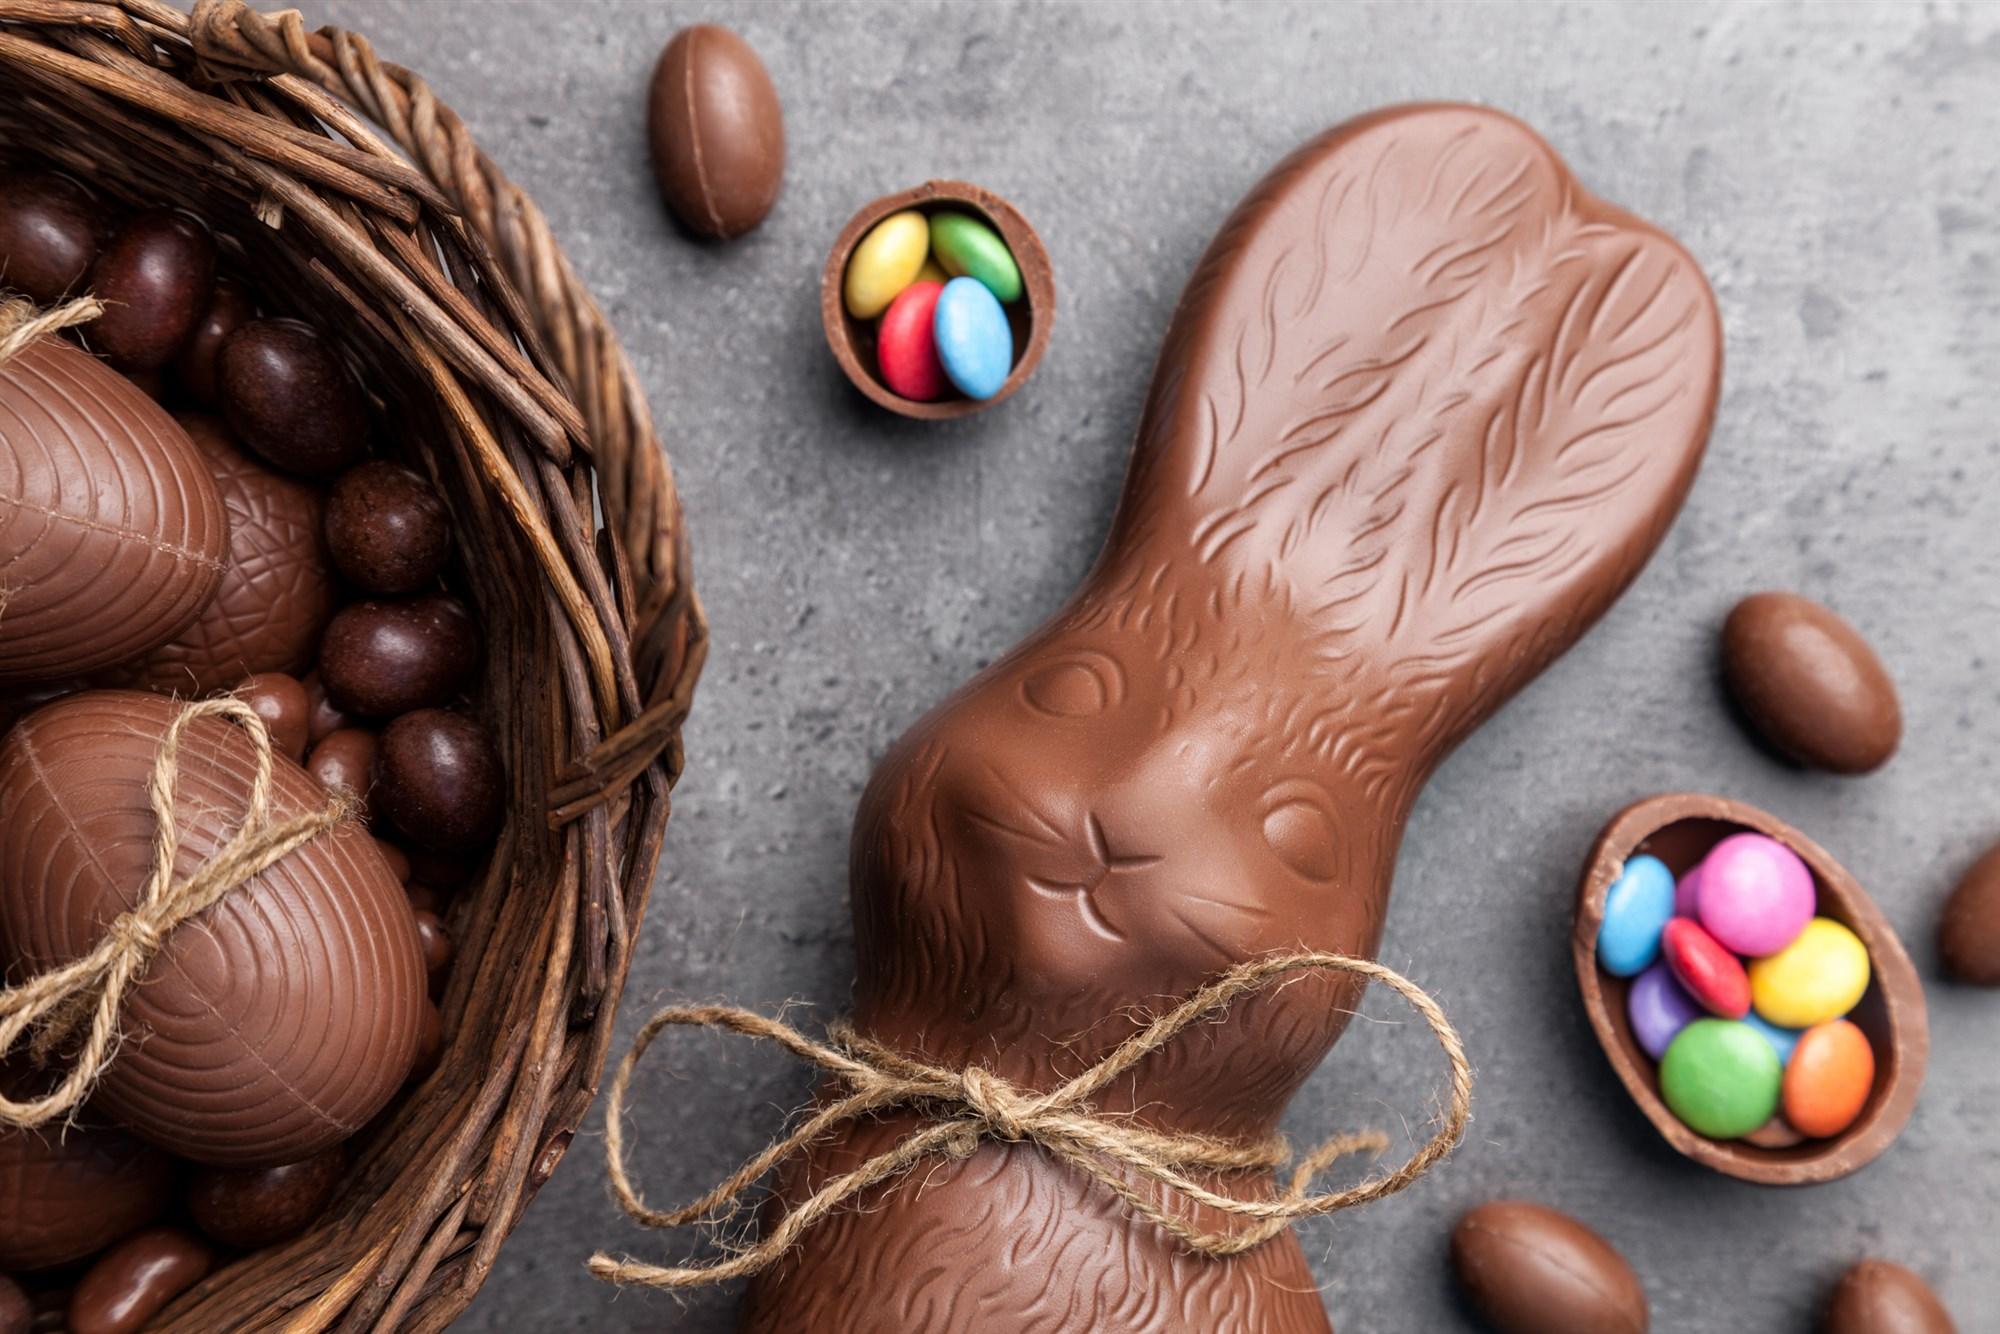 170412-better-chocolate-bunny-easter-se-335p_56963533f30696ec7e11f1525df3013c.fit-2000w_1555853559980.jpg